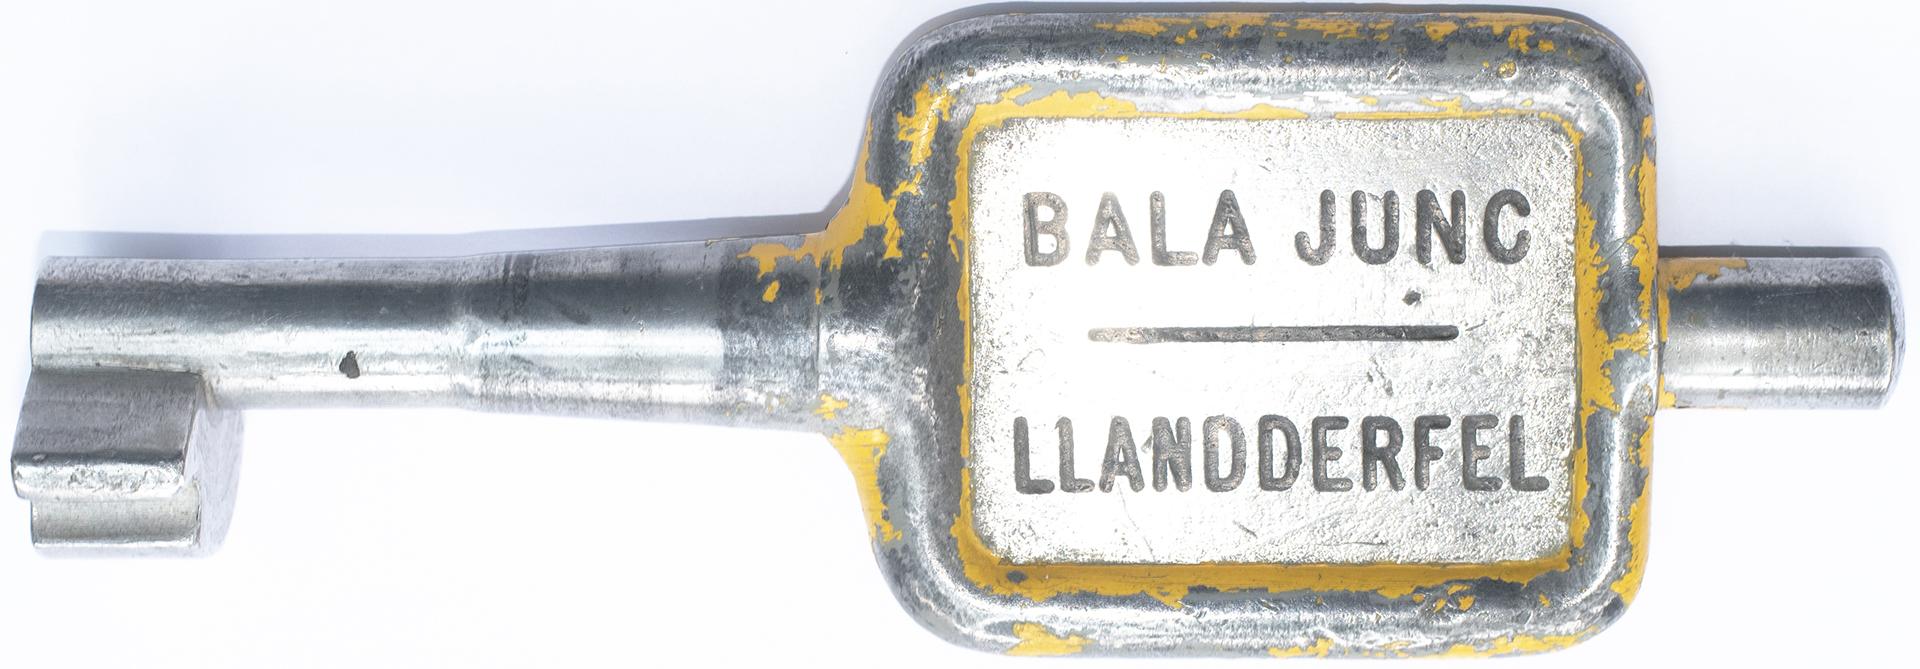 GWR/BR-W Tyers No9 single line aluminium key token BALA JUNC-LLANDDERFEL, configuration D. This